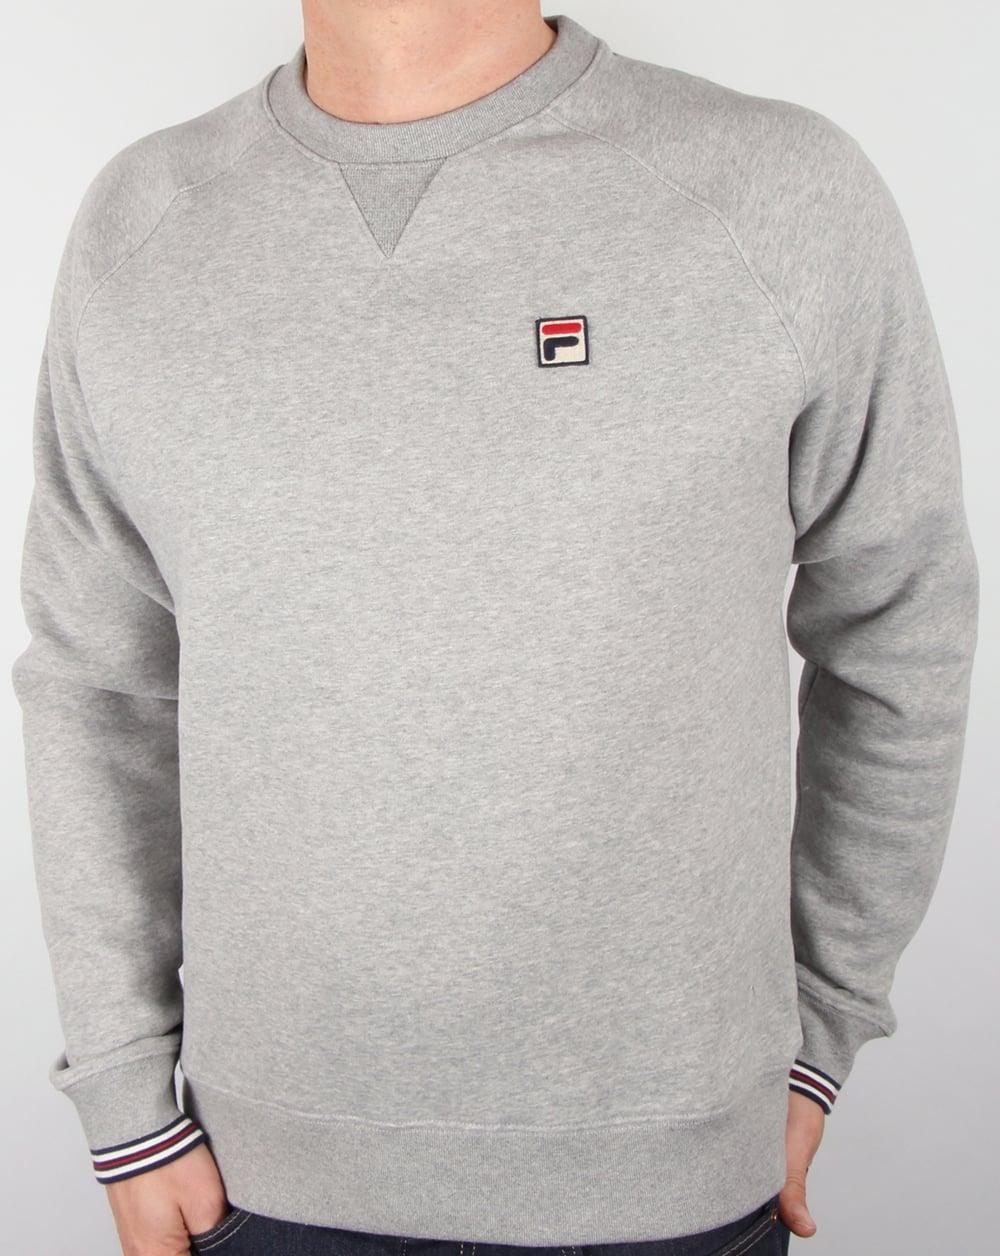 80eabd888182 Fila Vintage Fila Vintage Pozzi Sweatshirt Heather Grey